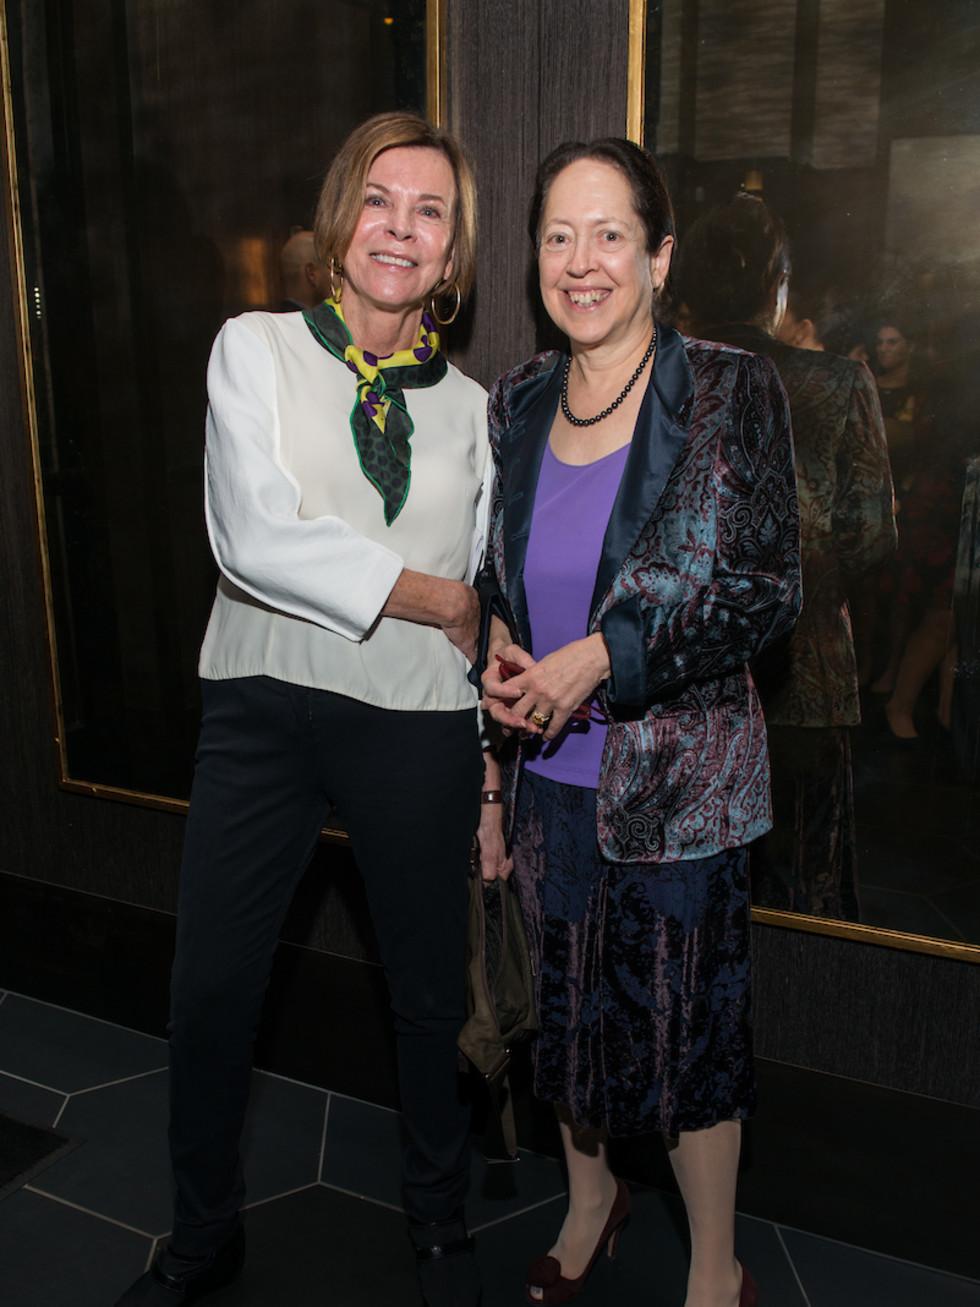 Dr Susan Landy and Dean Barbara Stoll